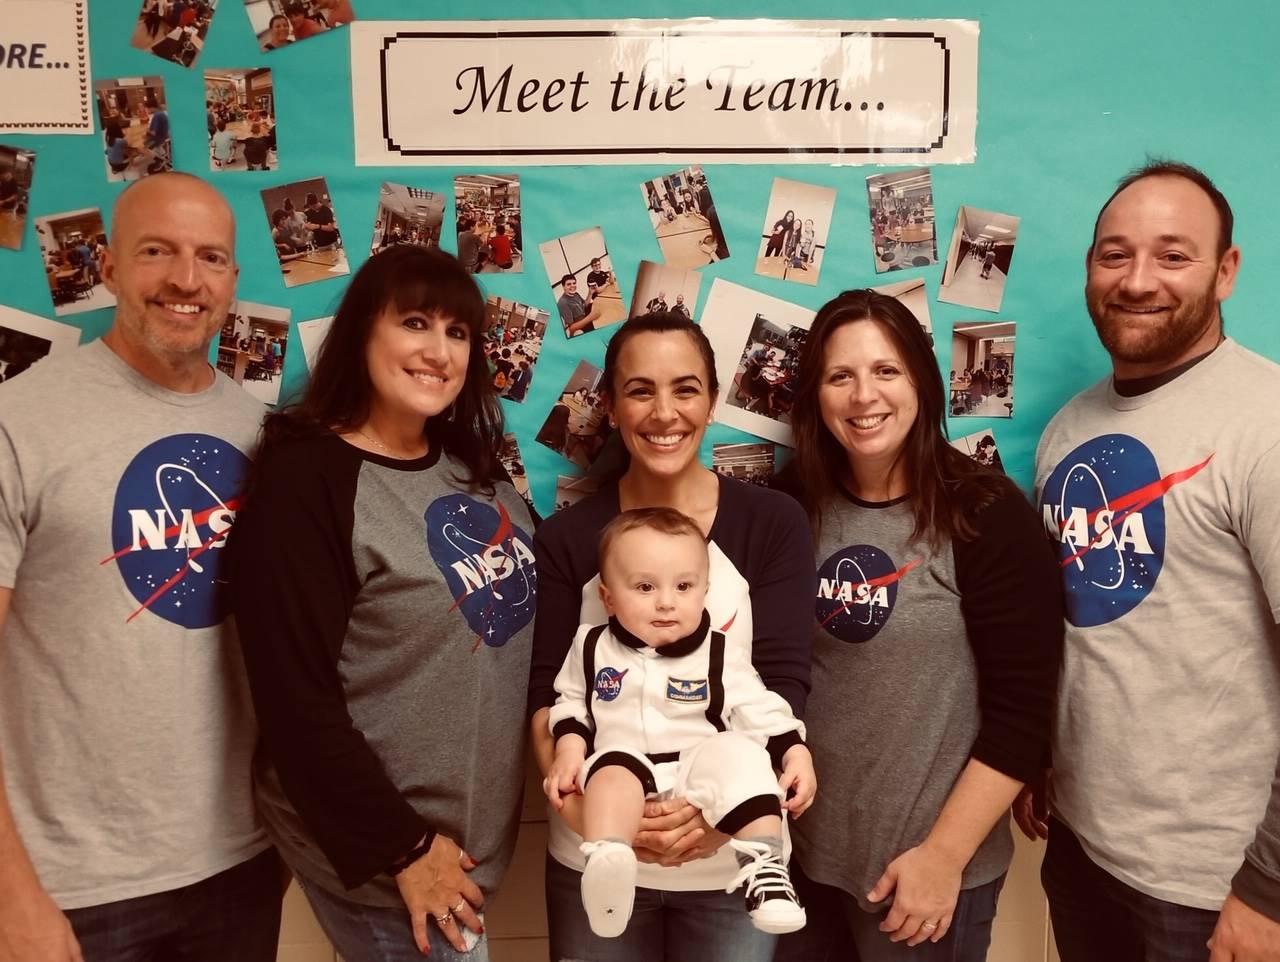 Team 8-1 Ambitious Astronauts